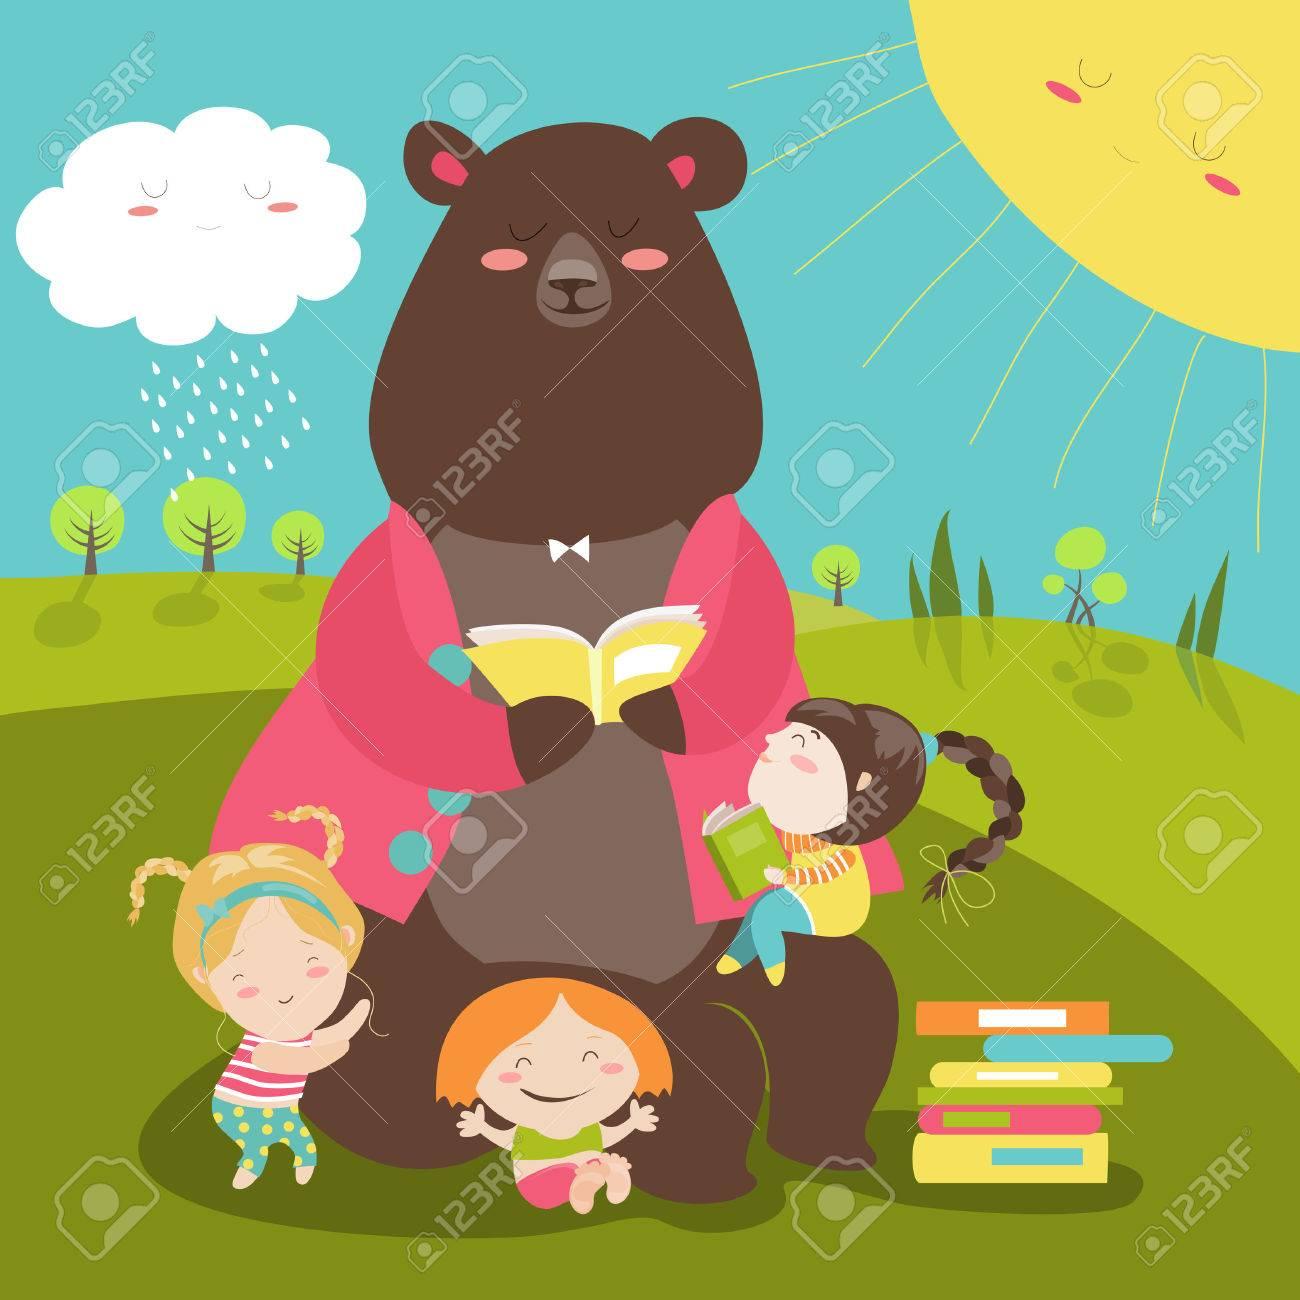 Cute bear reading book for girls. illustration - 56645360